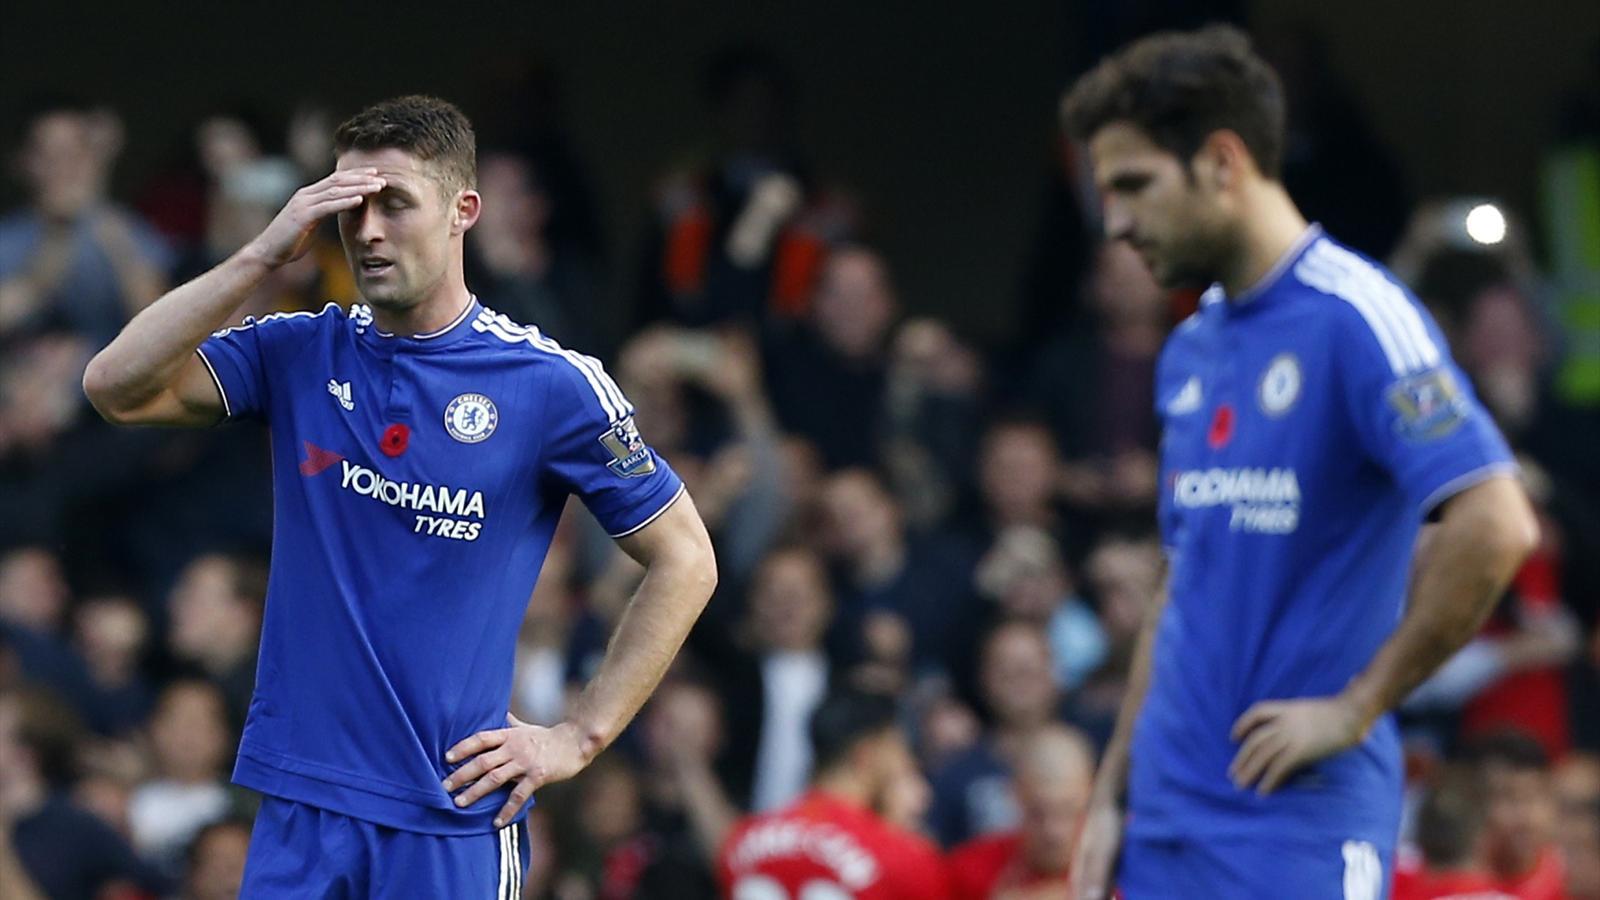 Chelsea's English defender Gary Cahill (L) and Chelsea's Spanish midfielder Cesc Fabregas